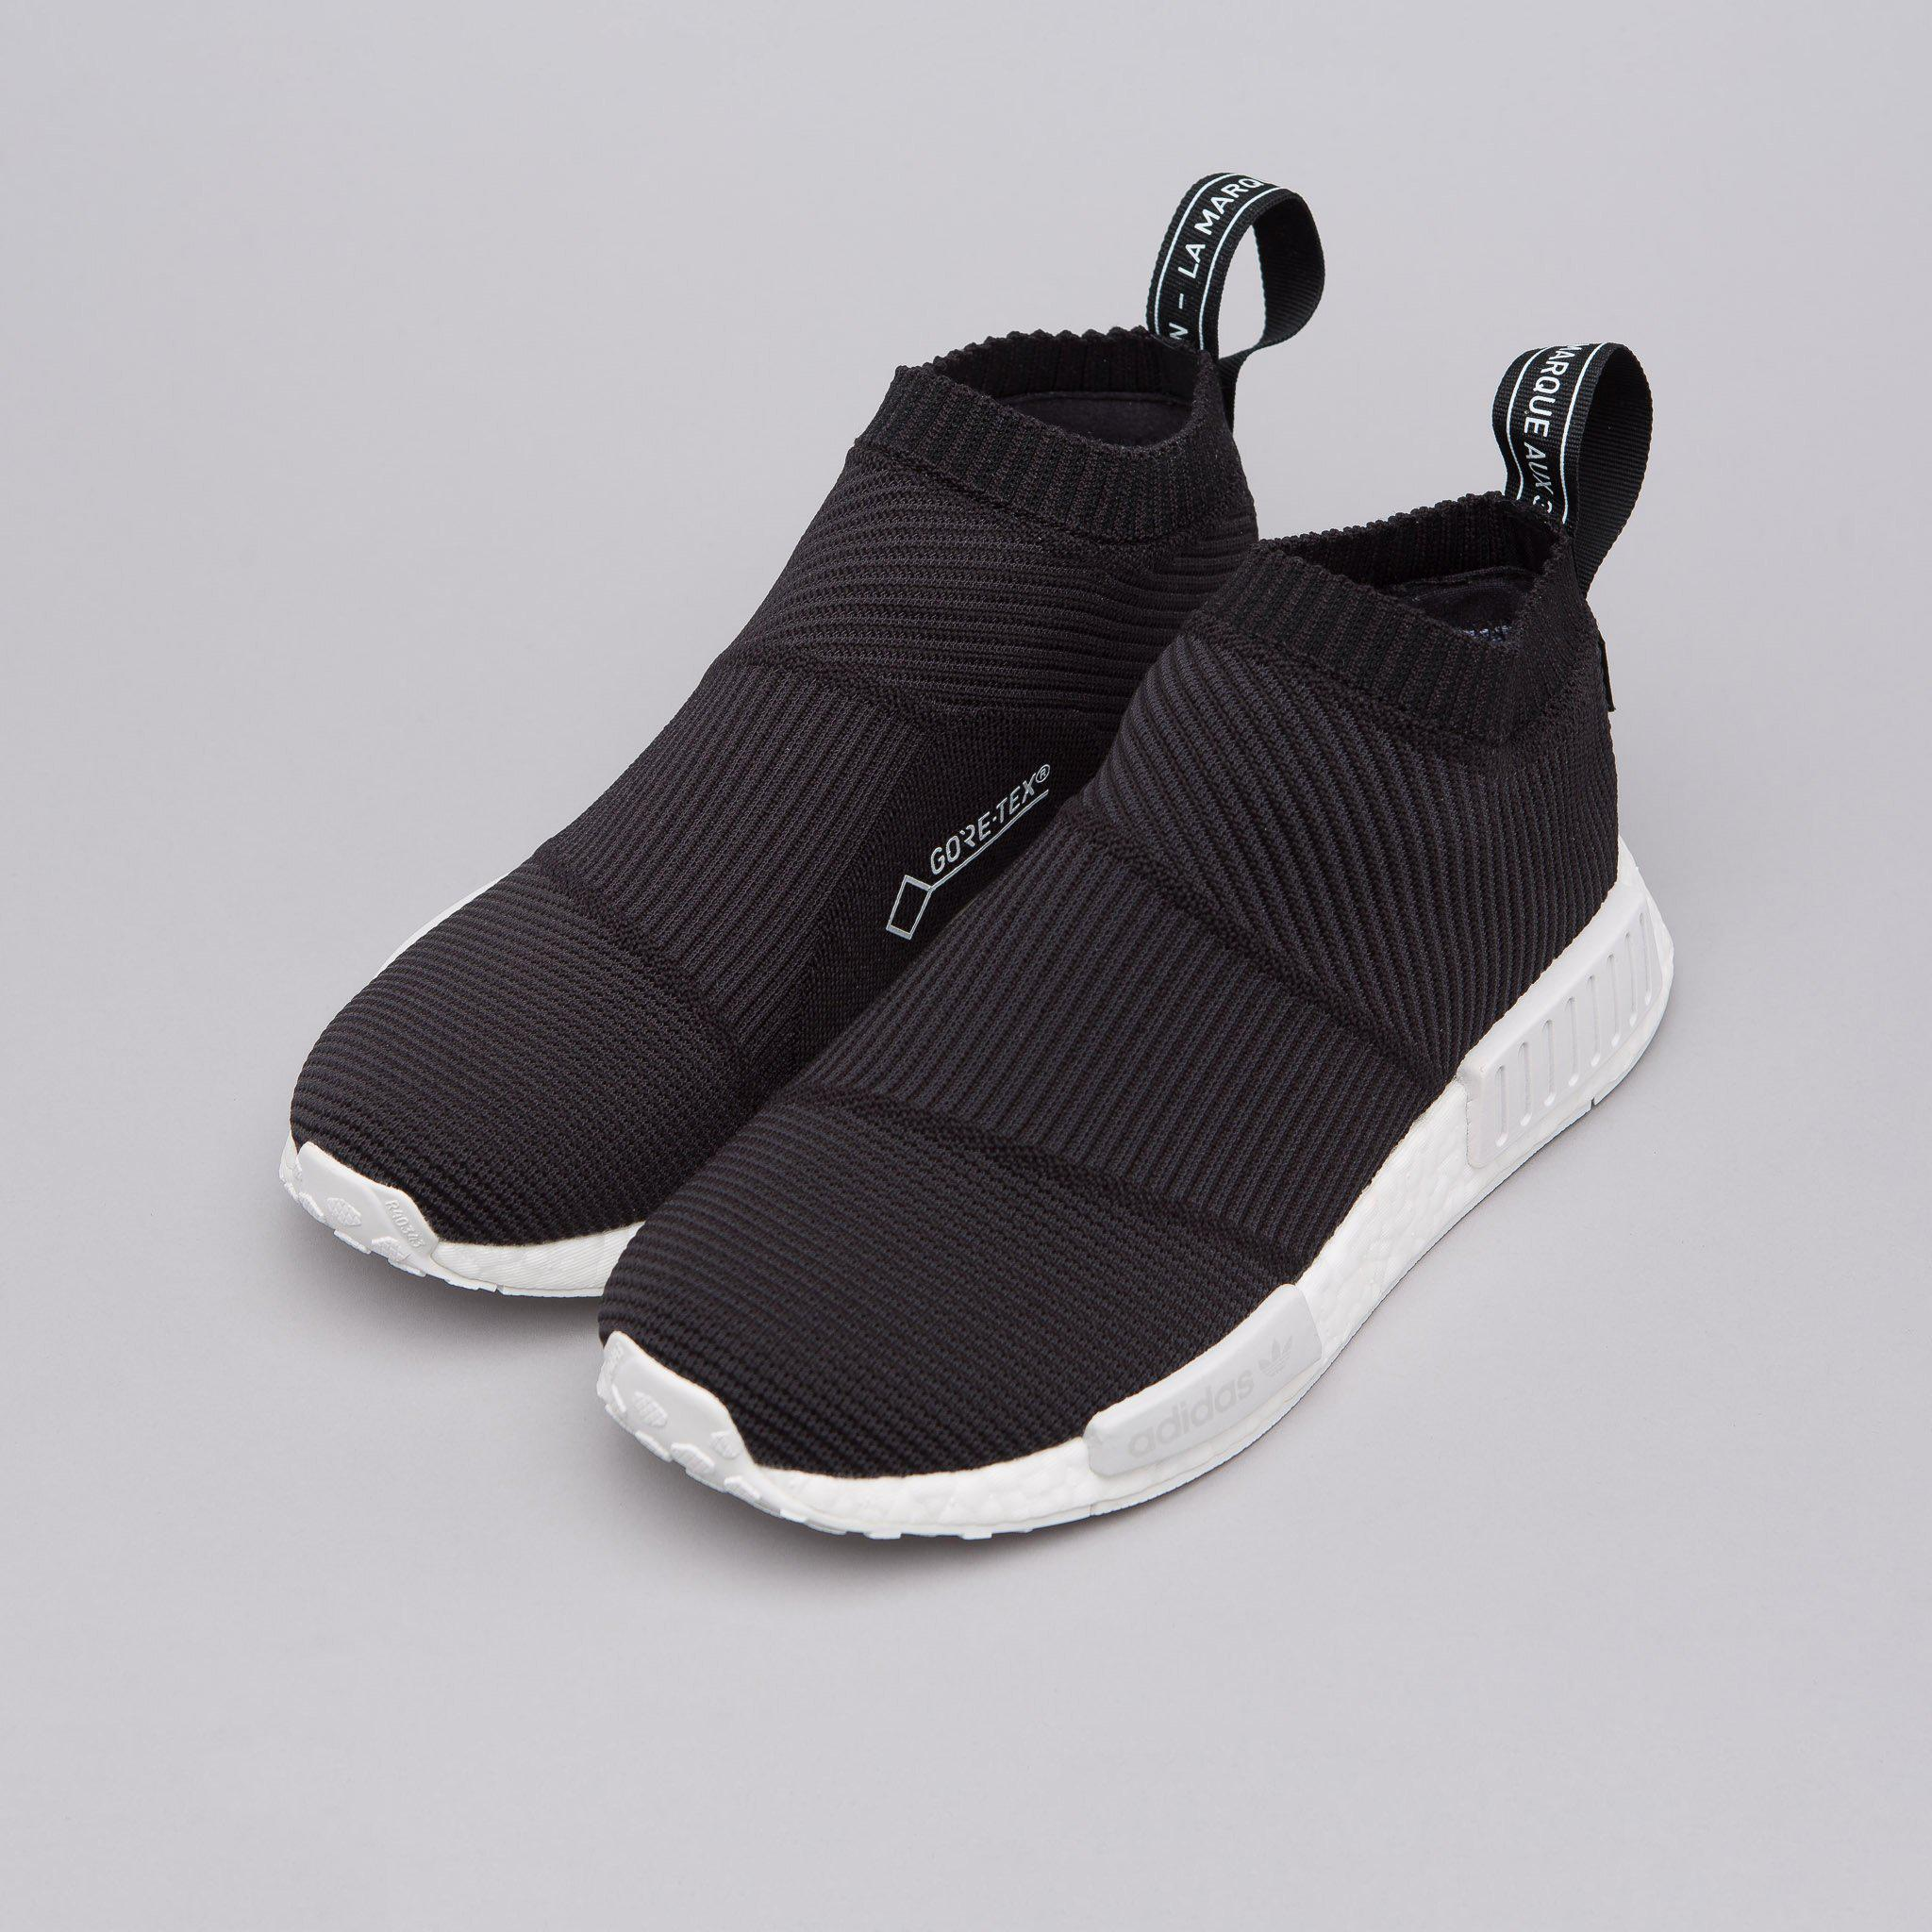 new products ca028 aefe7 Lyst - adidas Nmd Cs1 Primeknit Goretex In Core Black in Bla